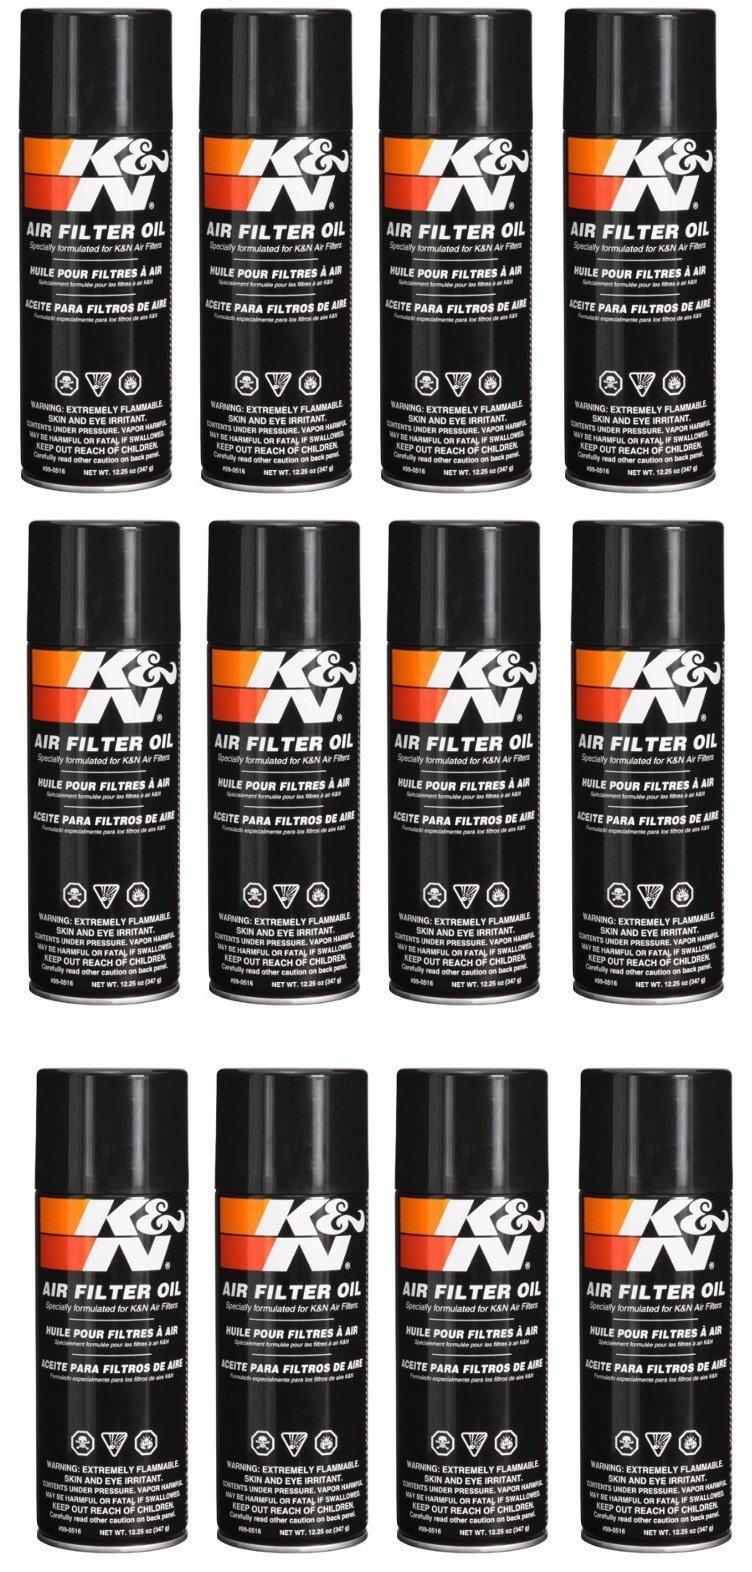 K&N 99-0516 Air Filter Oil - 12.25 oz. - Aerosol (12.25 Ounce - 12 Pack)